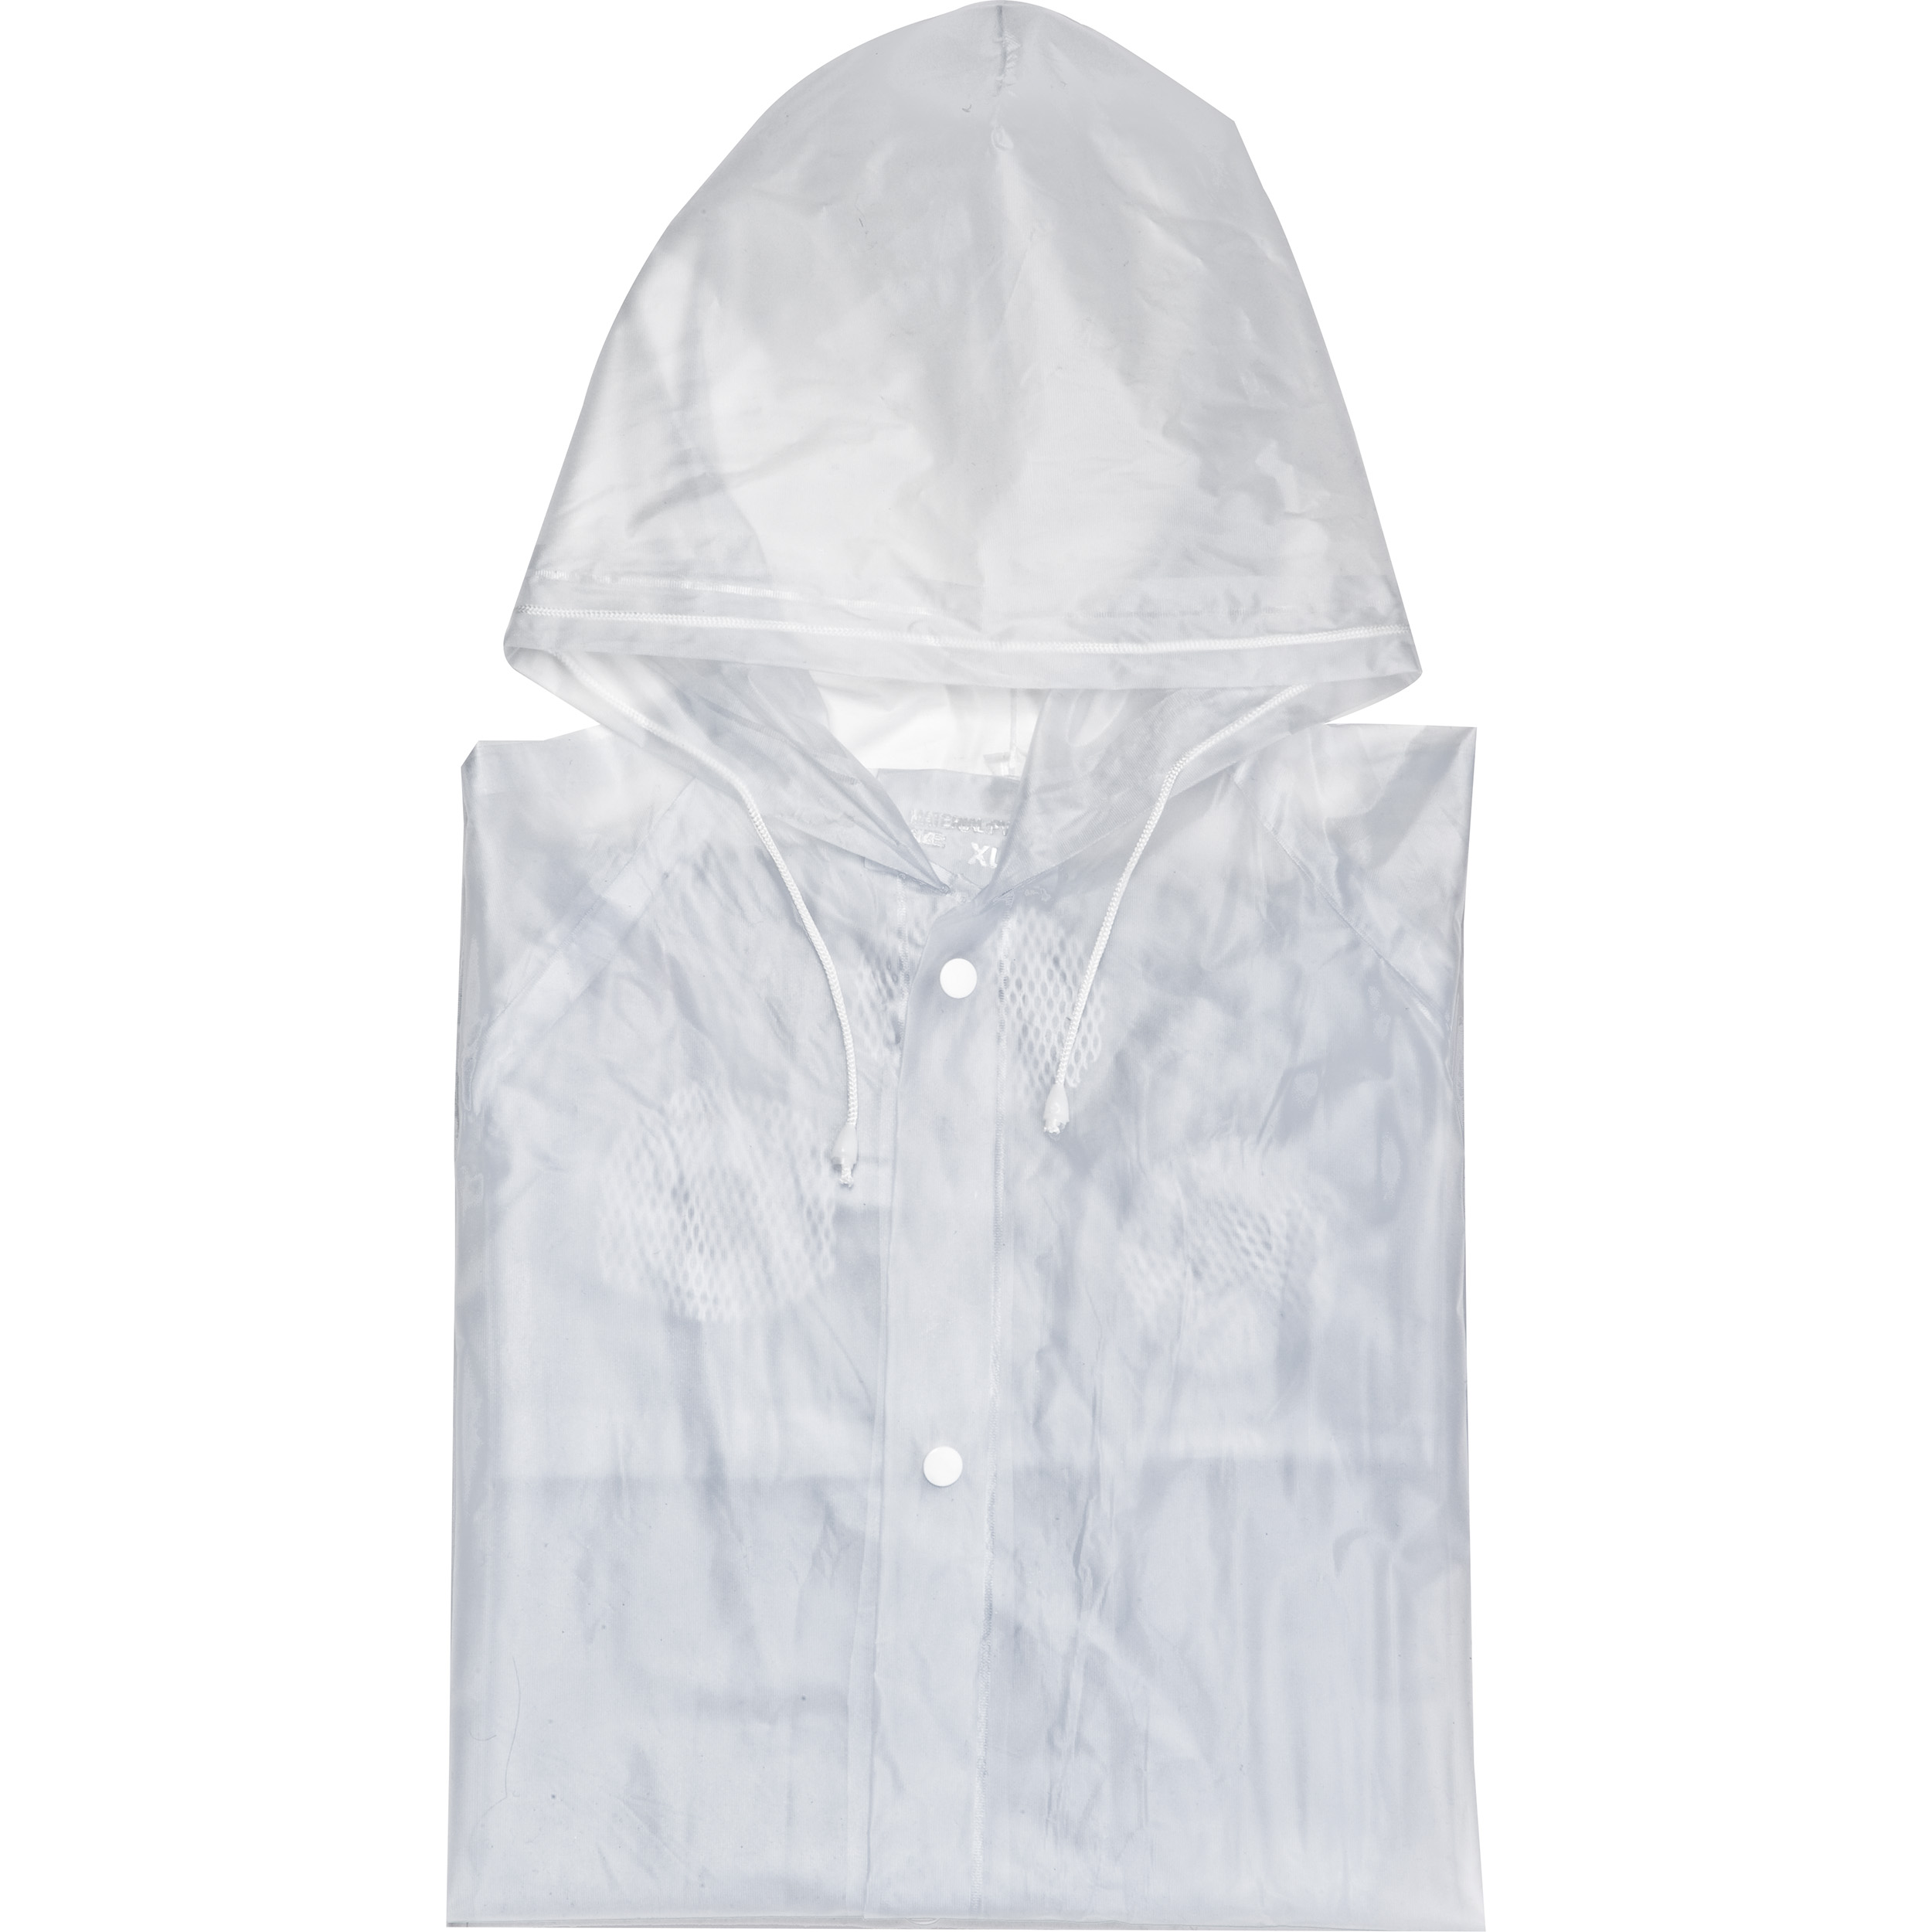 Raincoat XL, in PVC